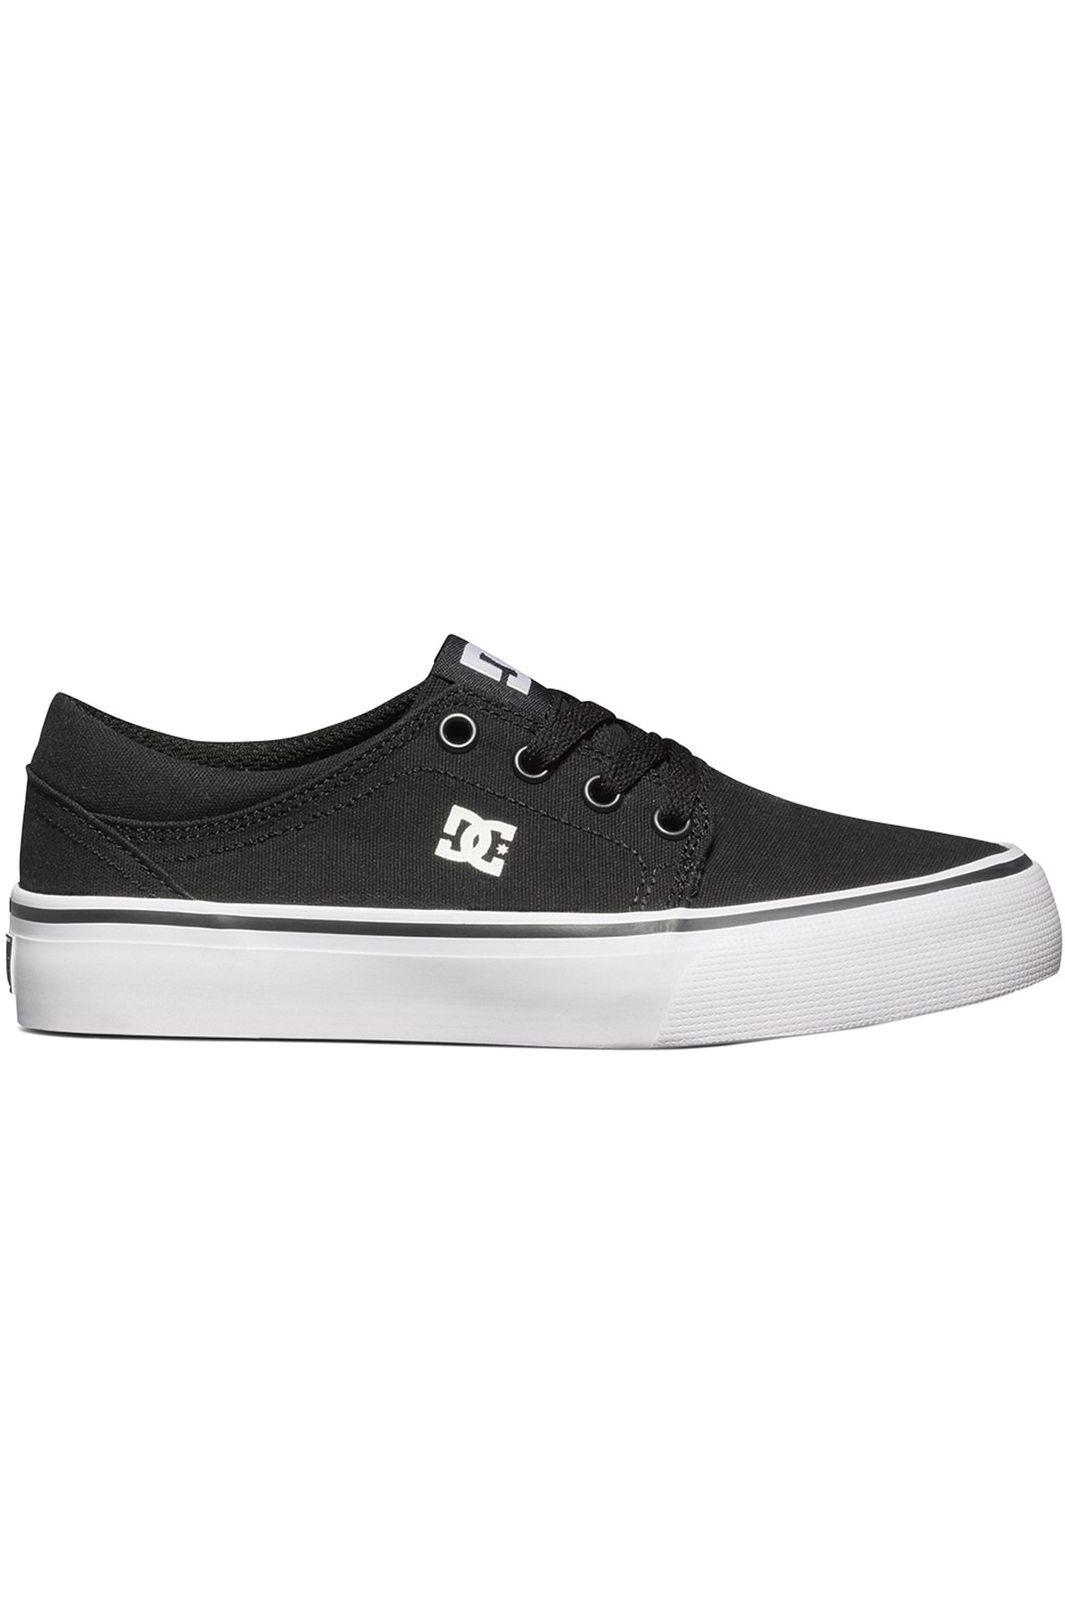 9c35765cd7ed9 Tenis DC Shoes TRASE TX Black White